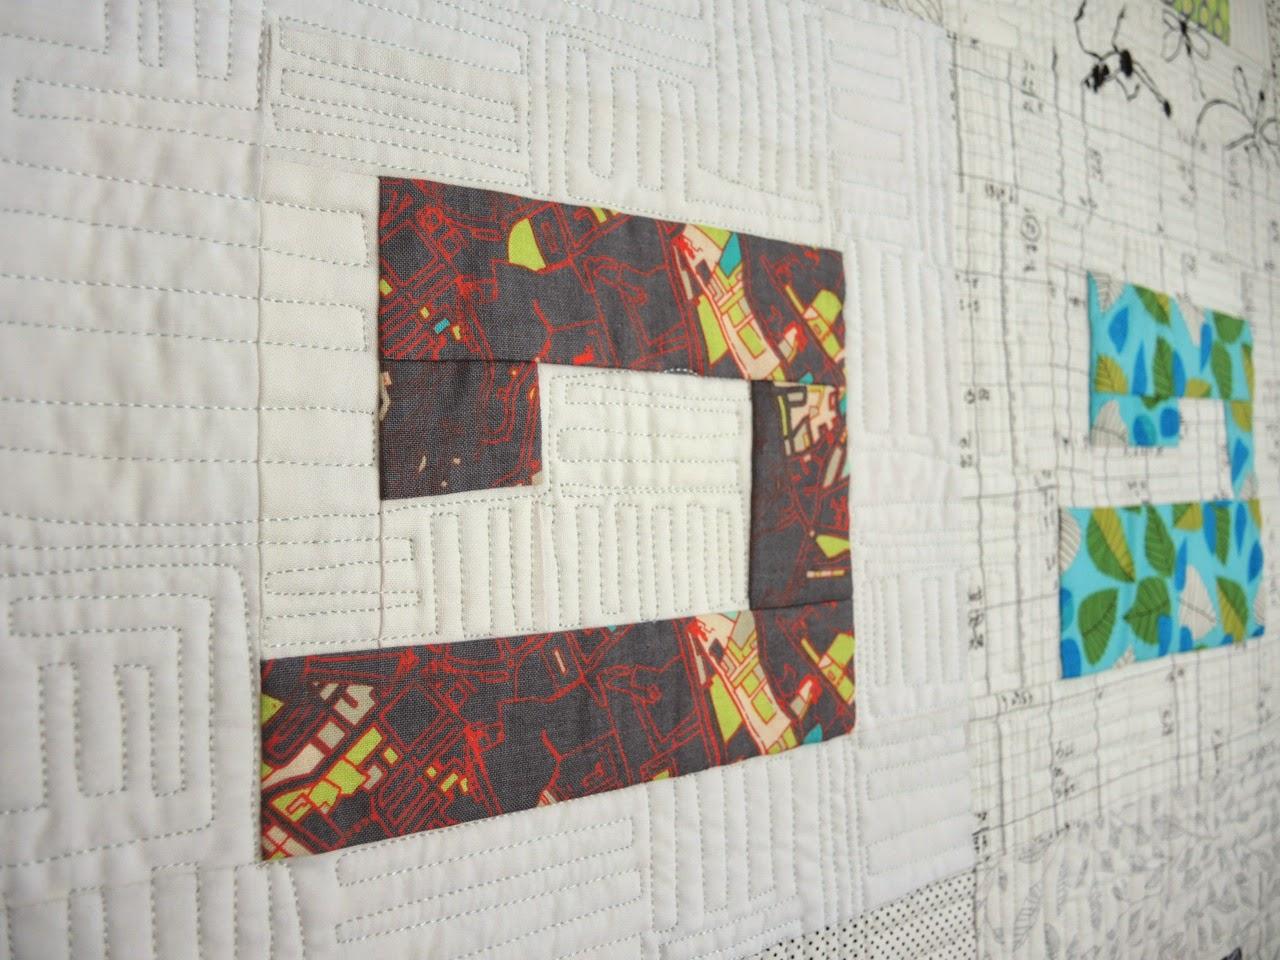 sewing+machine+quilt+final+2.jpg